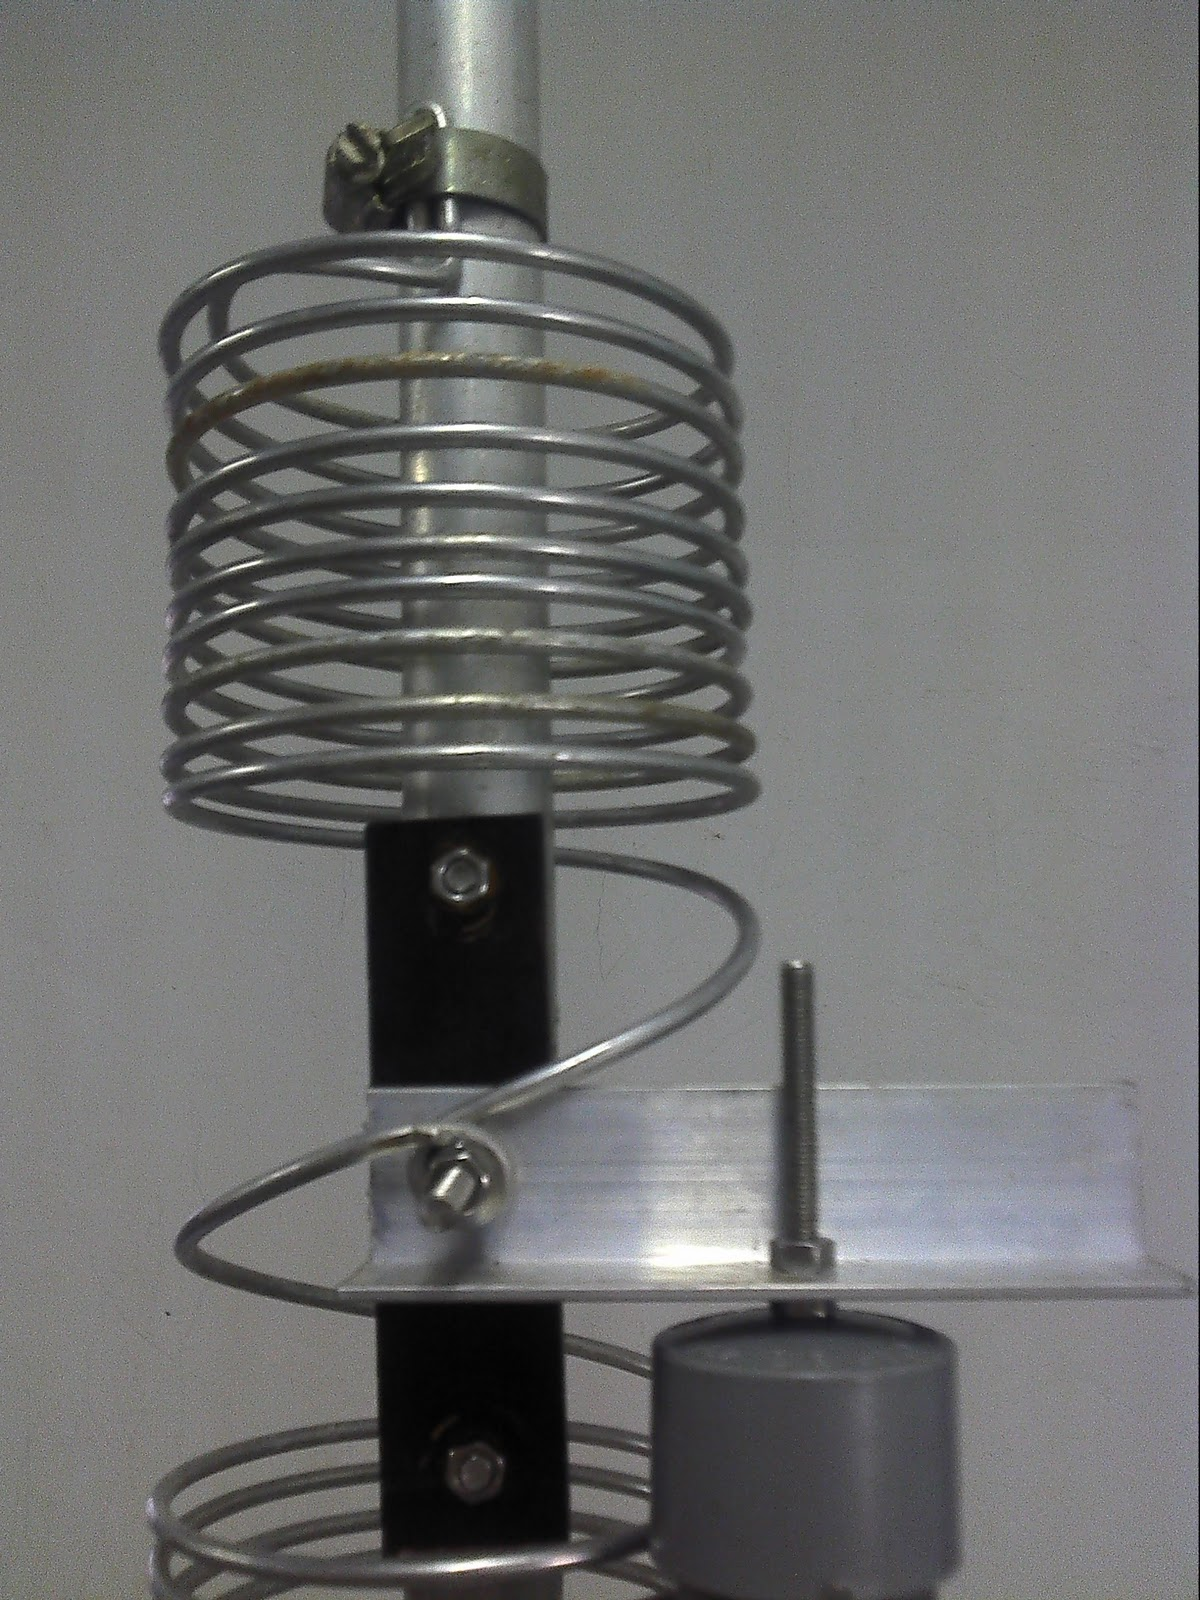 DalBeam Antenna by 9W2DAL: DV4080 HF VERTICAL 40M/80M DUAL BAND